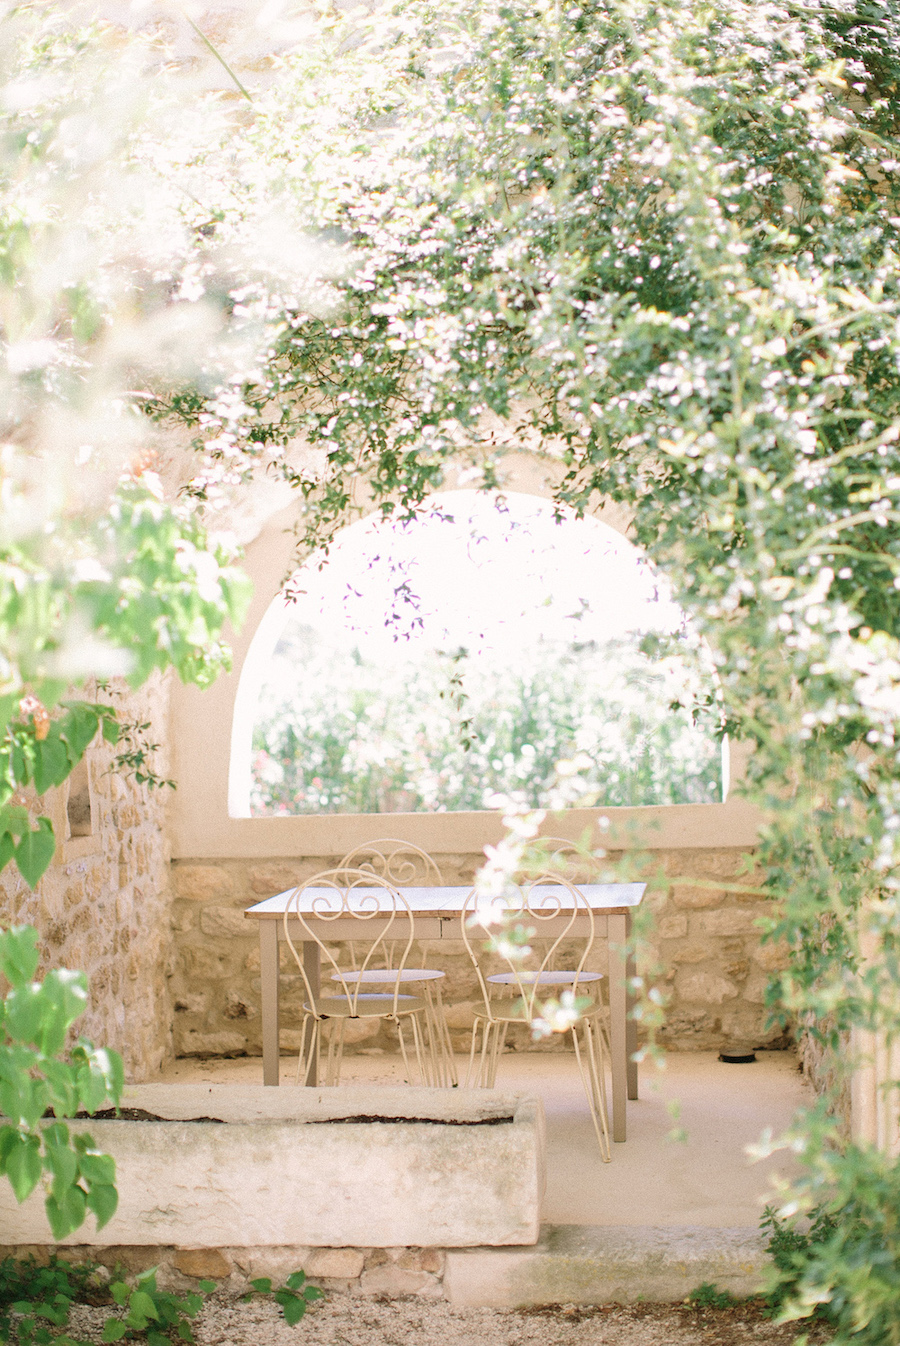 saya-photography-rustic-french-wedding-provence-domaines-de-patras-23.jpg